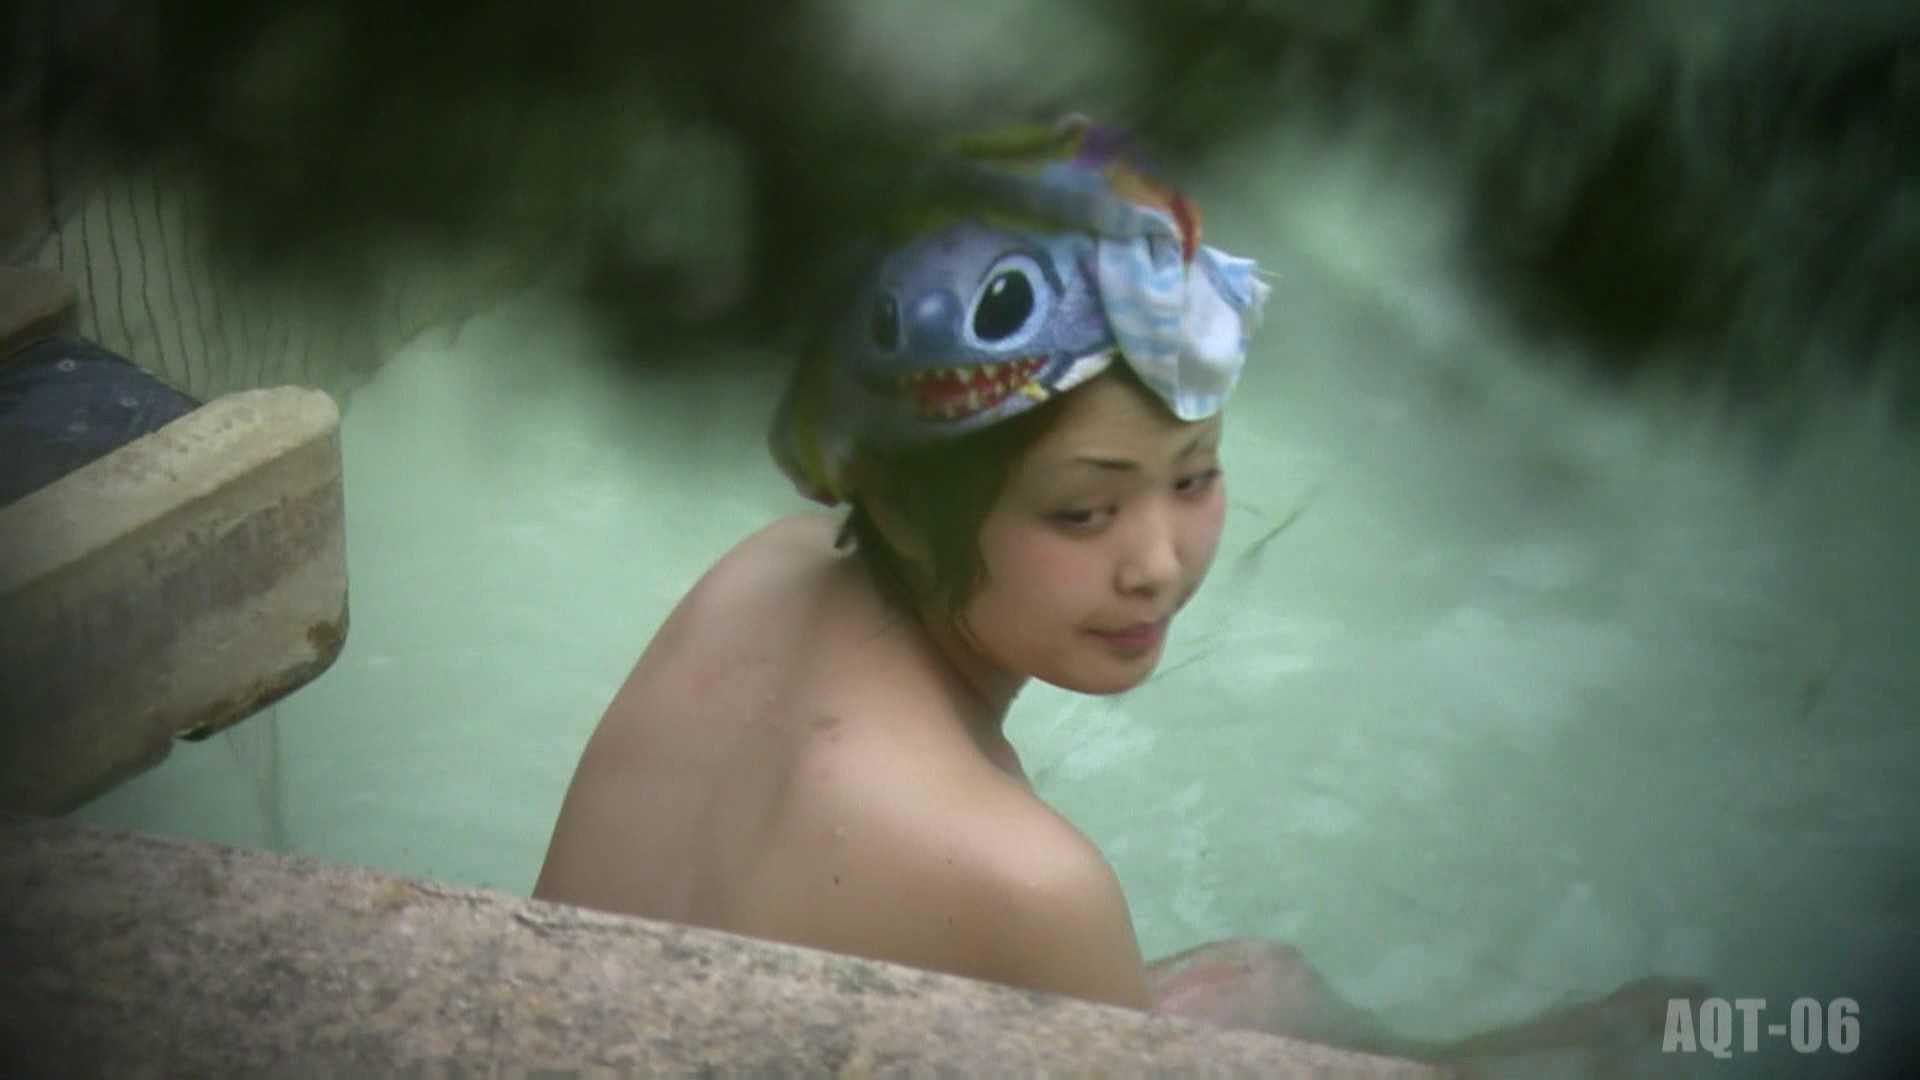 Aquaな露天風呂Vol.761 OLのエロ生活   露天風呂  97連発 46